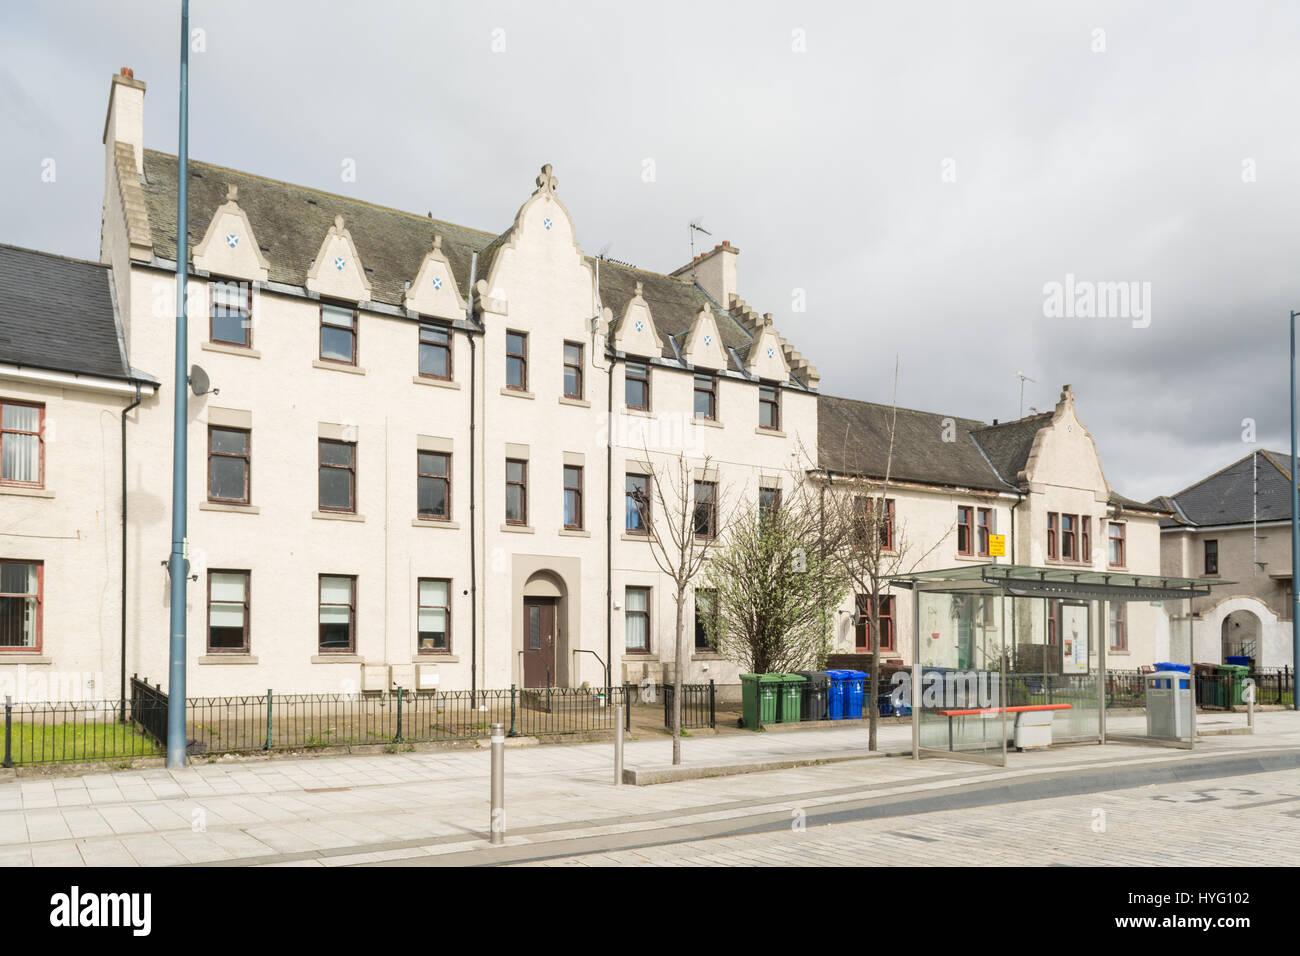 Drip Road, Raploch, Stirling, Scotland, UK - housing block of flats - Stock Image